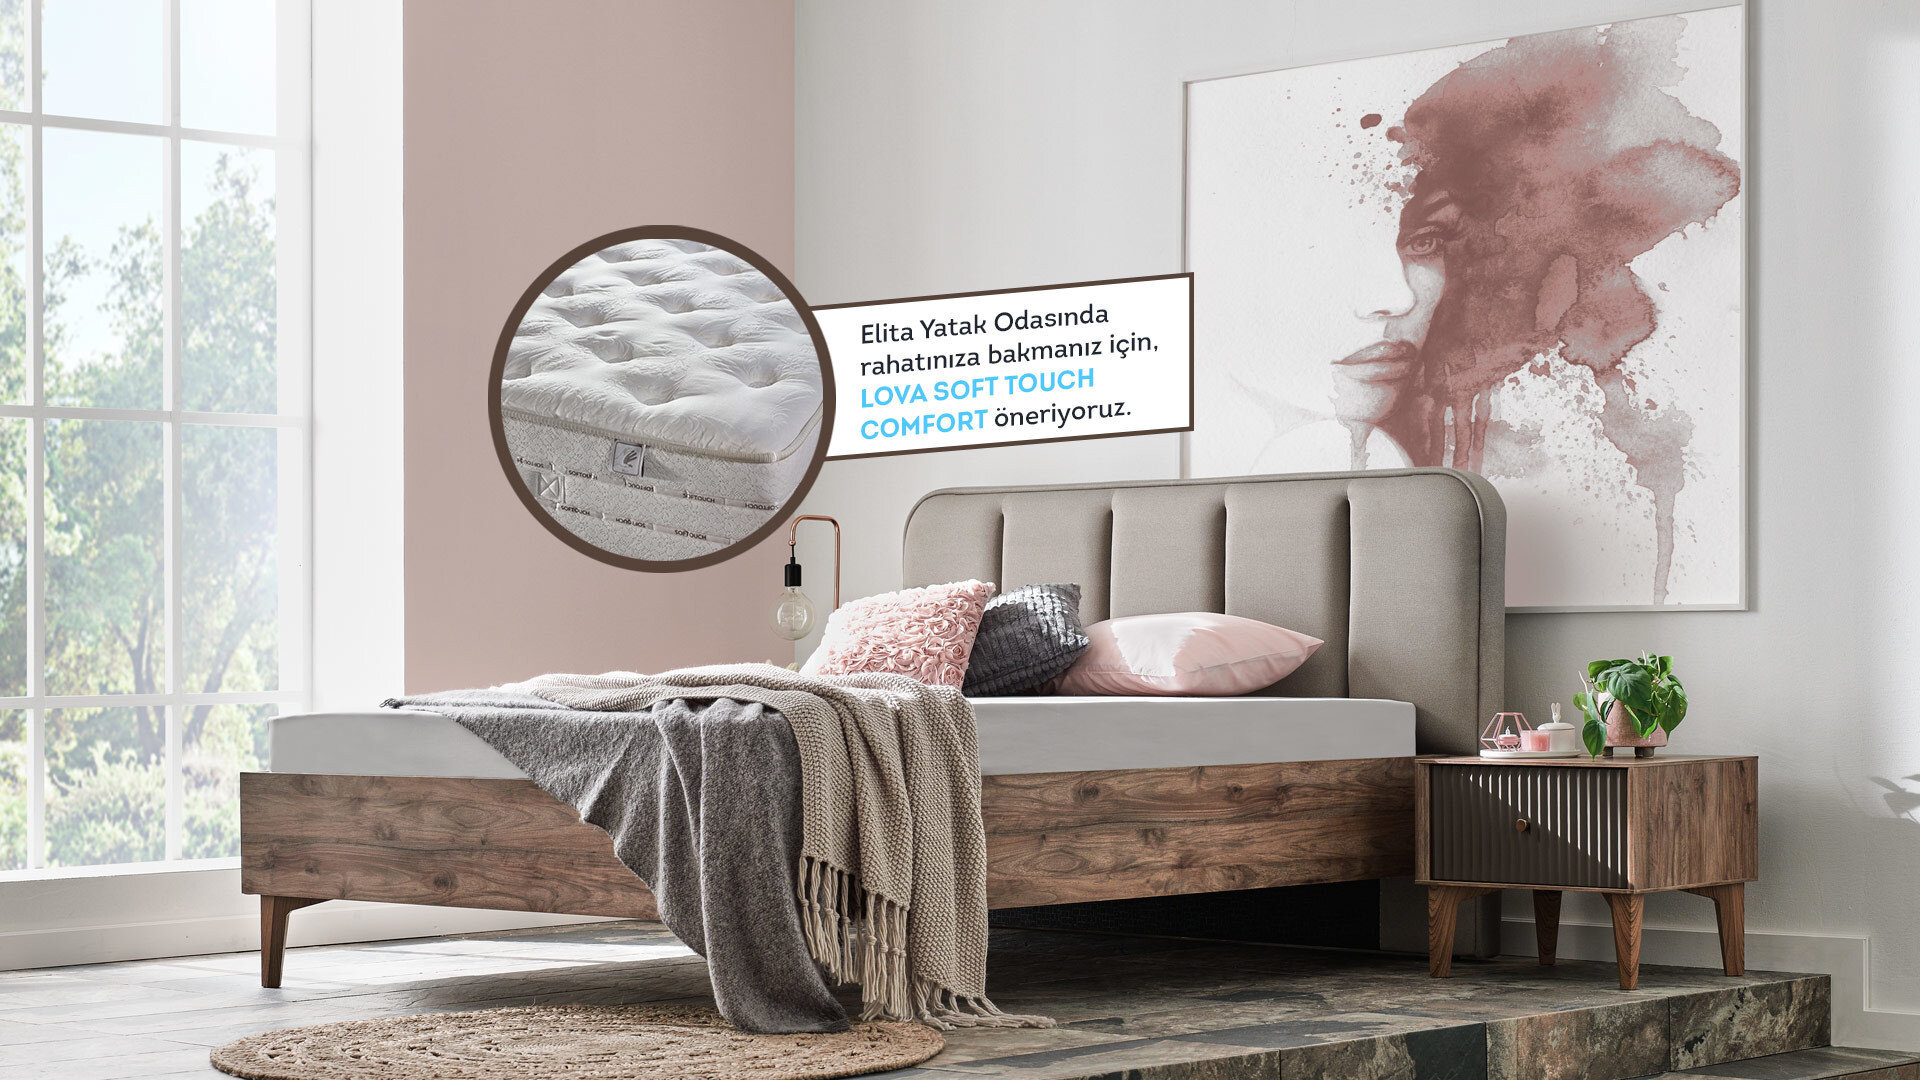 Elıta Yatak Odası